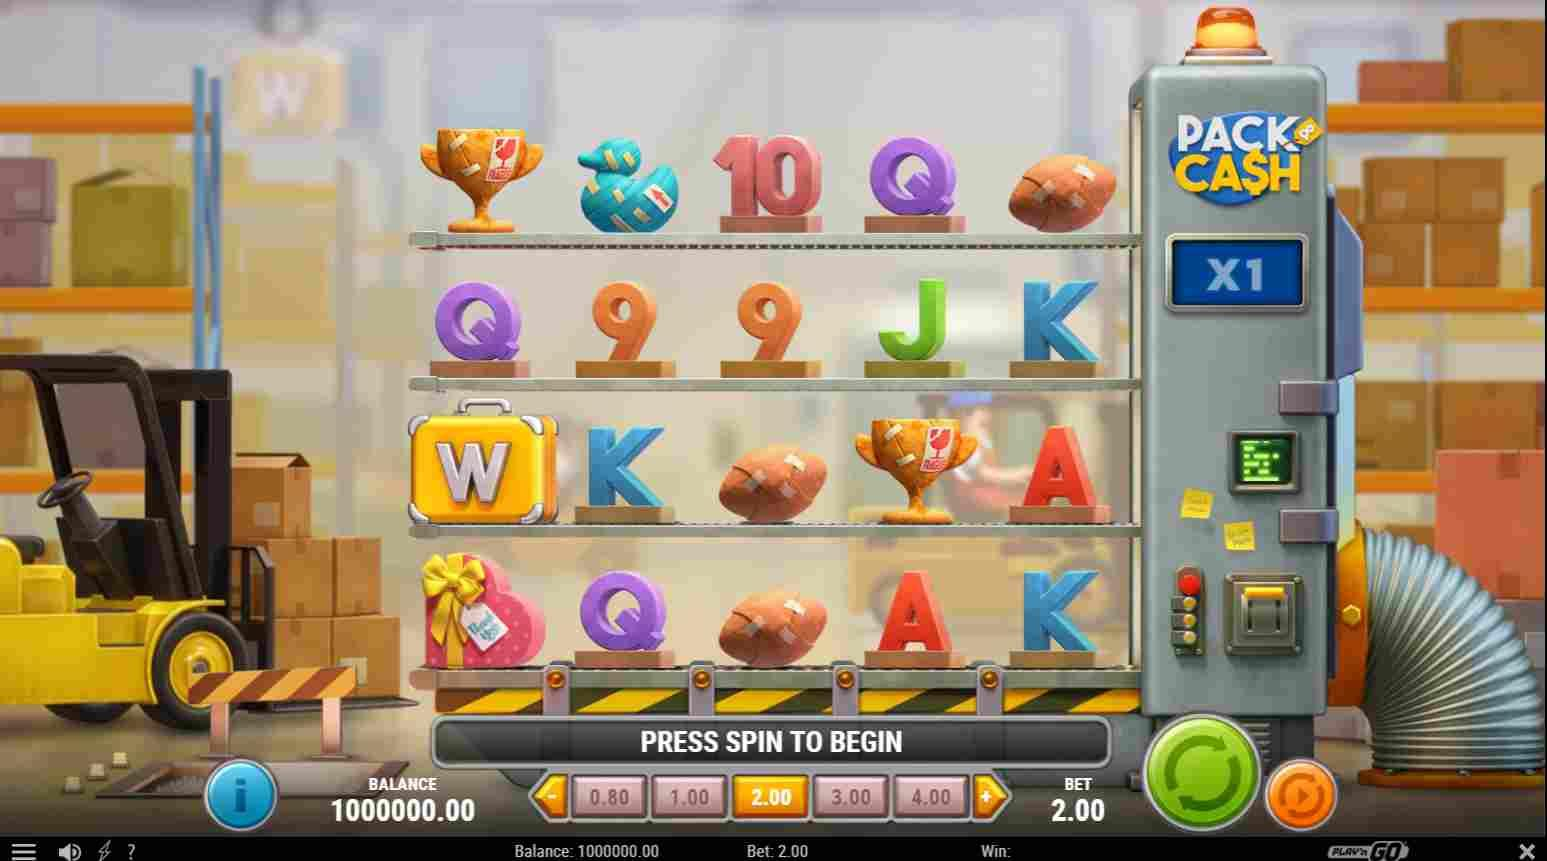 Pack and Cash Slot Base